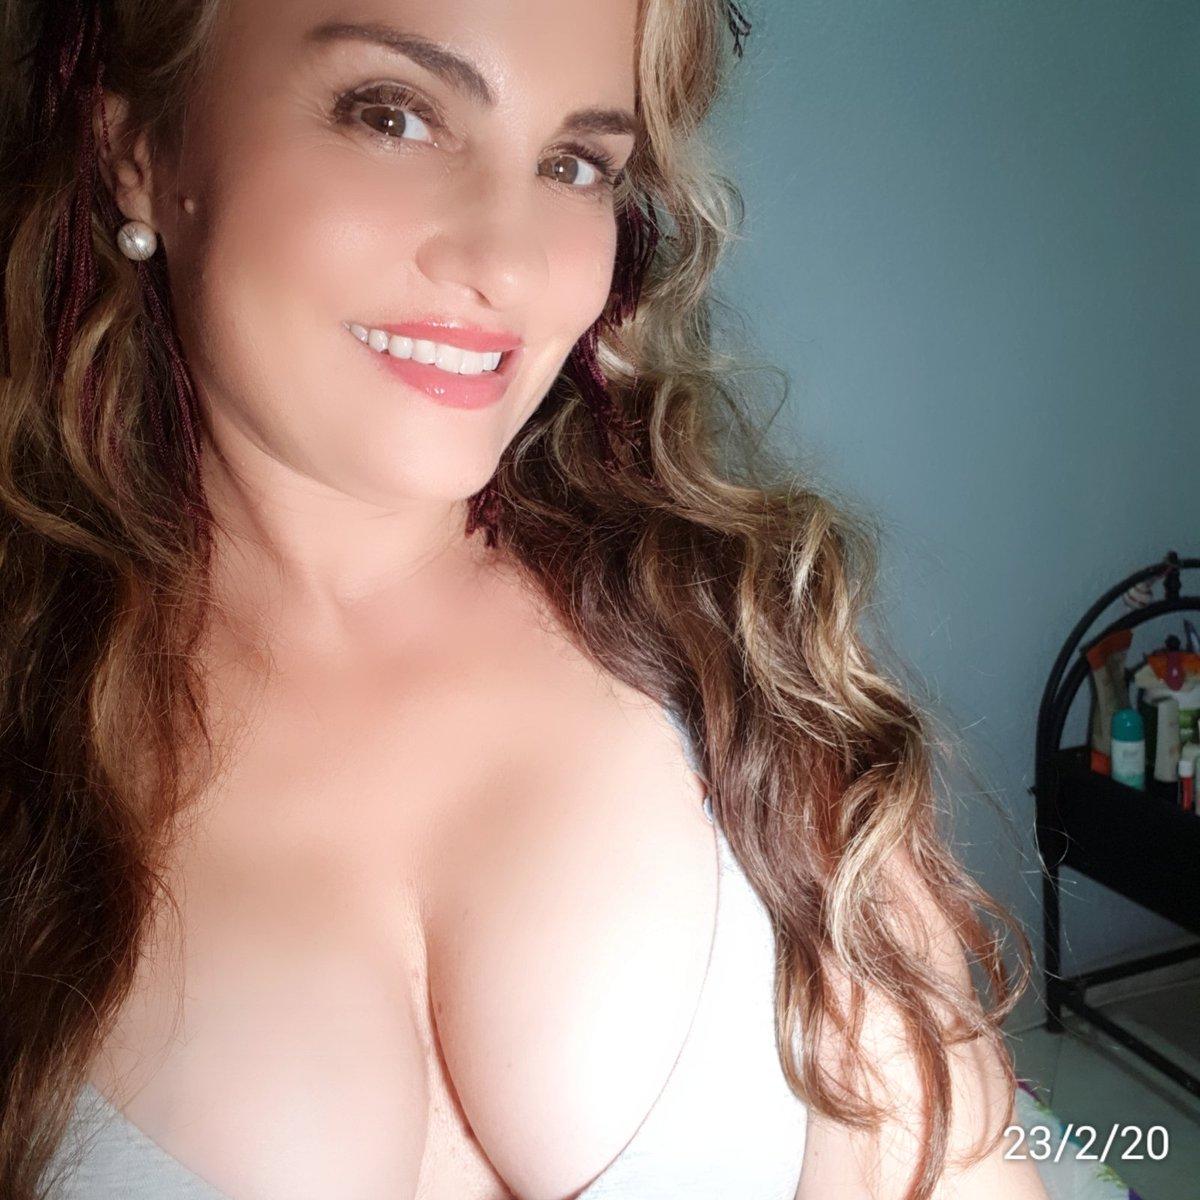 A gift for you...#MotivationMonday #24Febrero #Feliz #auracristinageithner#beautiful #lapotradelabanda #Colombia #happy #vscocam #girl #instagramers #iger #love #loveyouall #actresslife #model #loveislove #smile #follow #2020pic.twitter.com/Zv6Uge93Vj